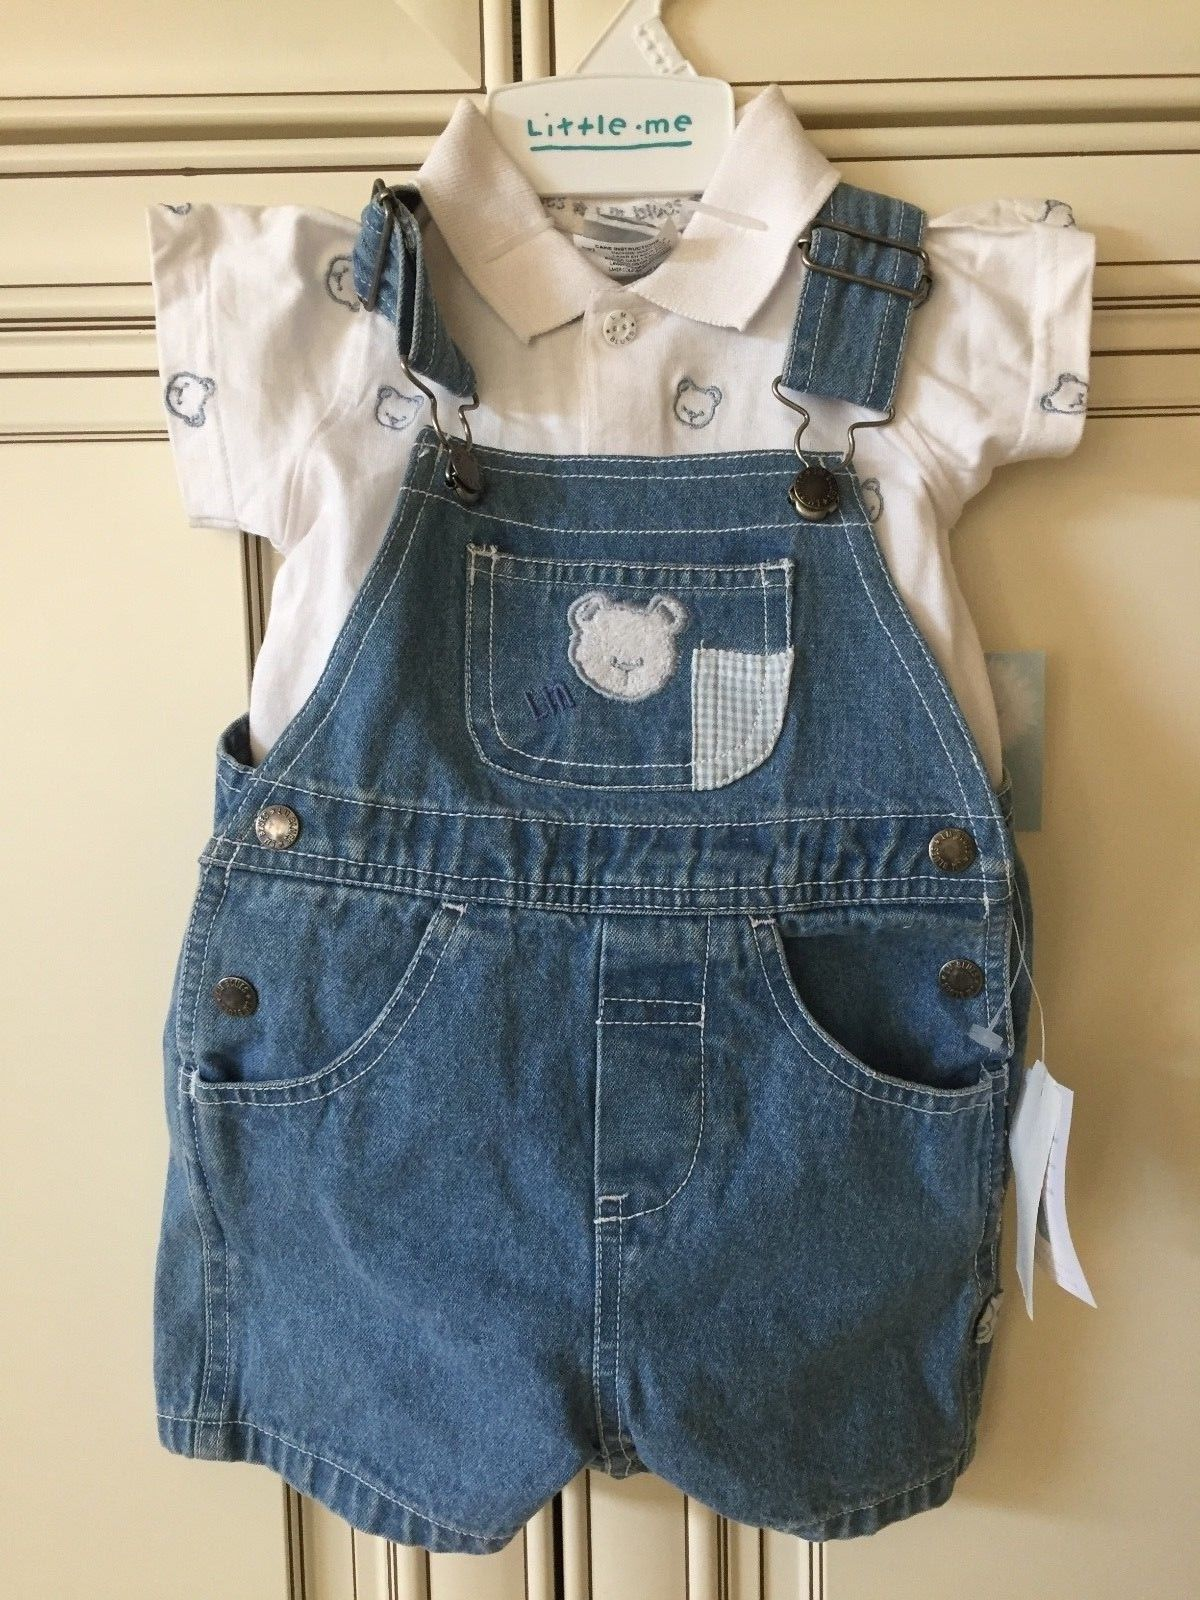 Girls NANNETTE seersucker shirt dress outfit 12-18 2T 3T 4T 5 6 NWT ruffle pants